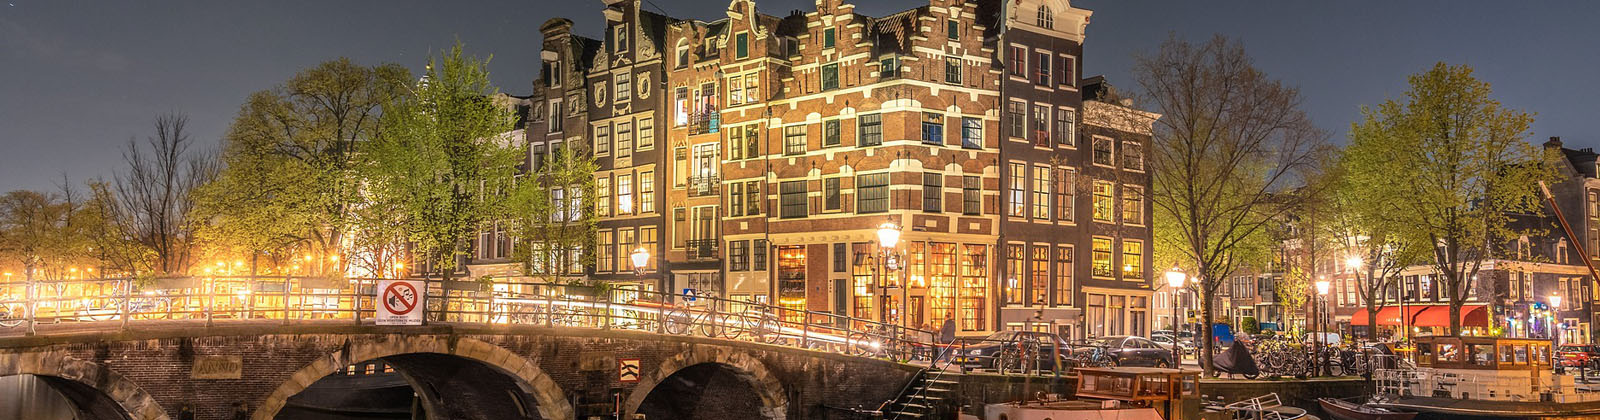 DMC Amsterdam services